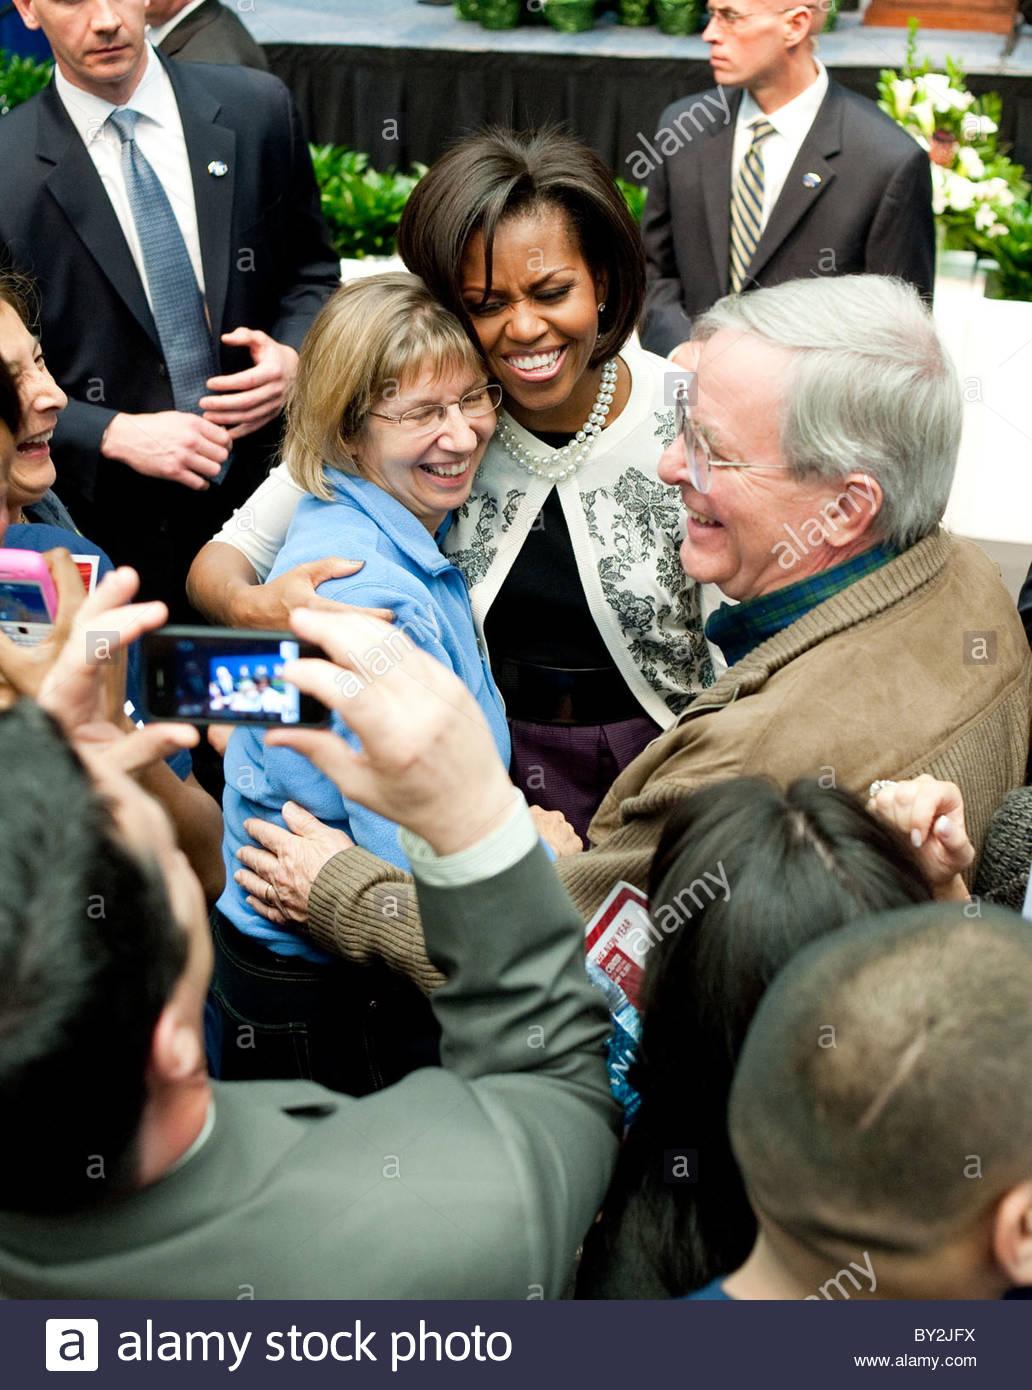 Michelle Obama gives a hug to shooting survivor Pam Simon, Rep. Gabrielle Giffords' outreach coordinator who was - Stock Image